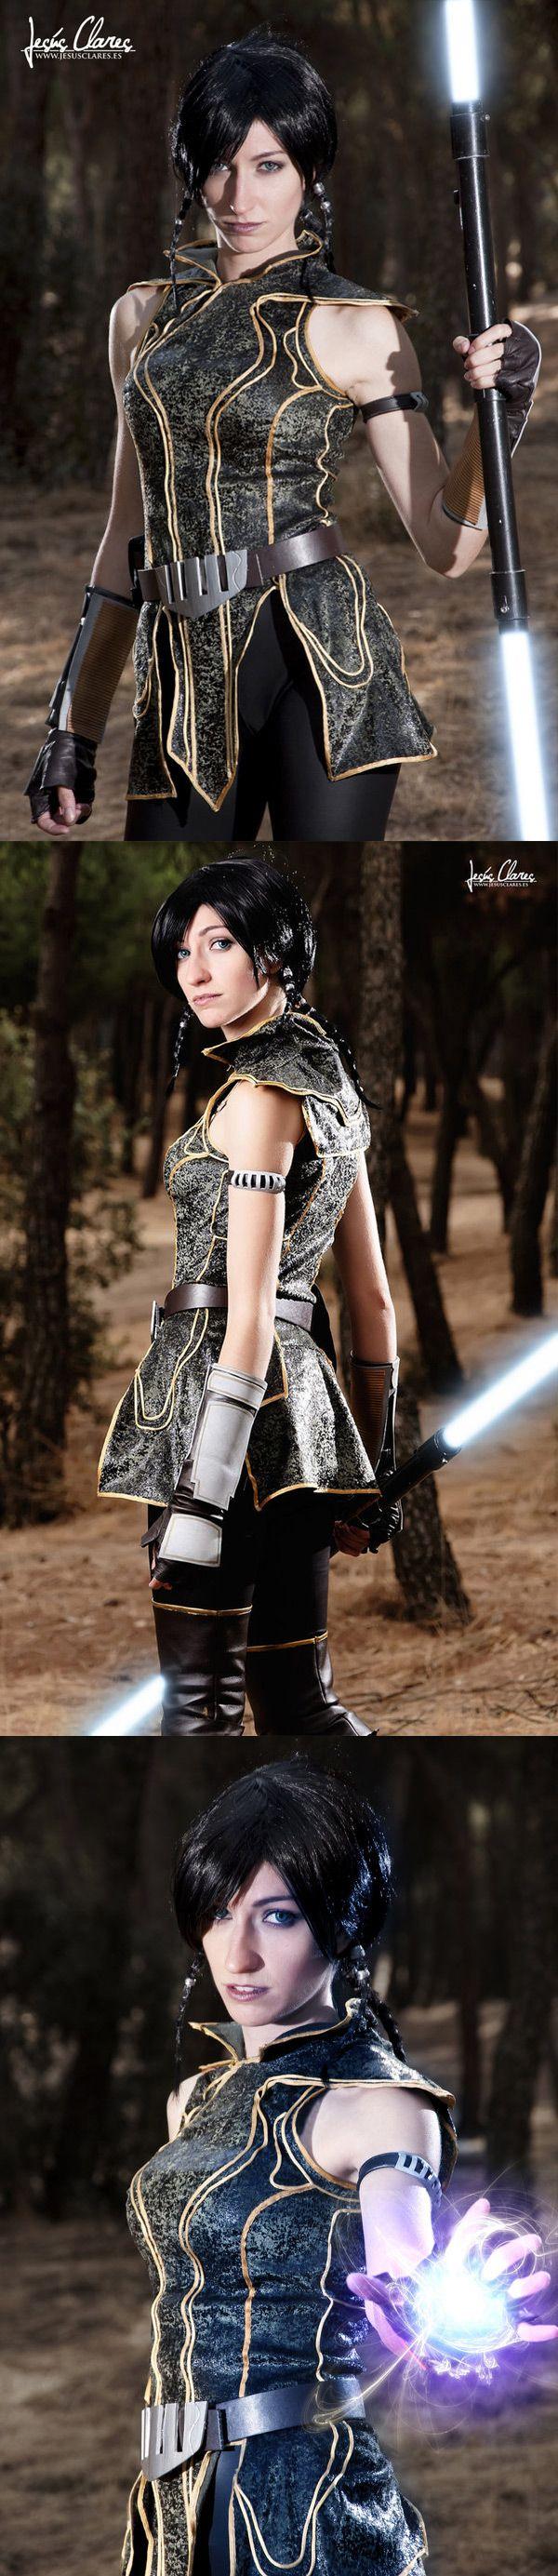 Satele Shan from Star Wars Old Republic and Mass Effect | Cosplayer: Shanoa Nebulaluben photo: Hidrico